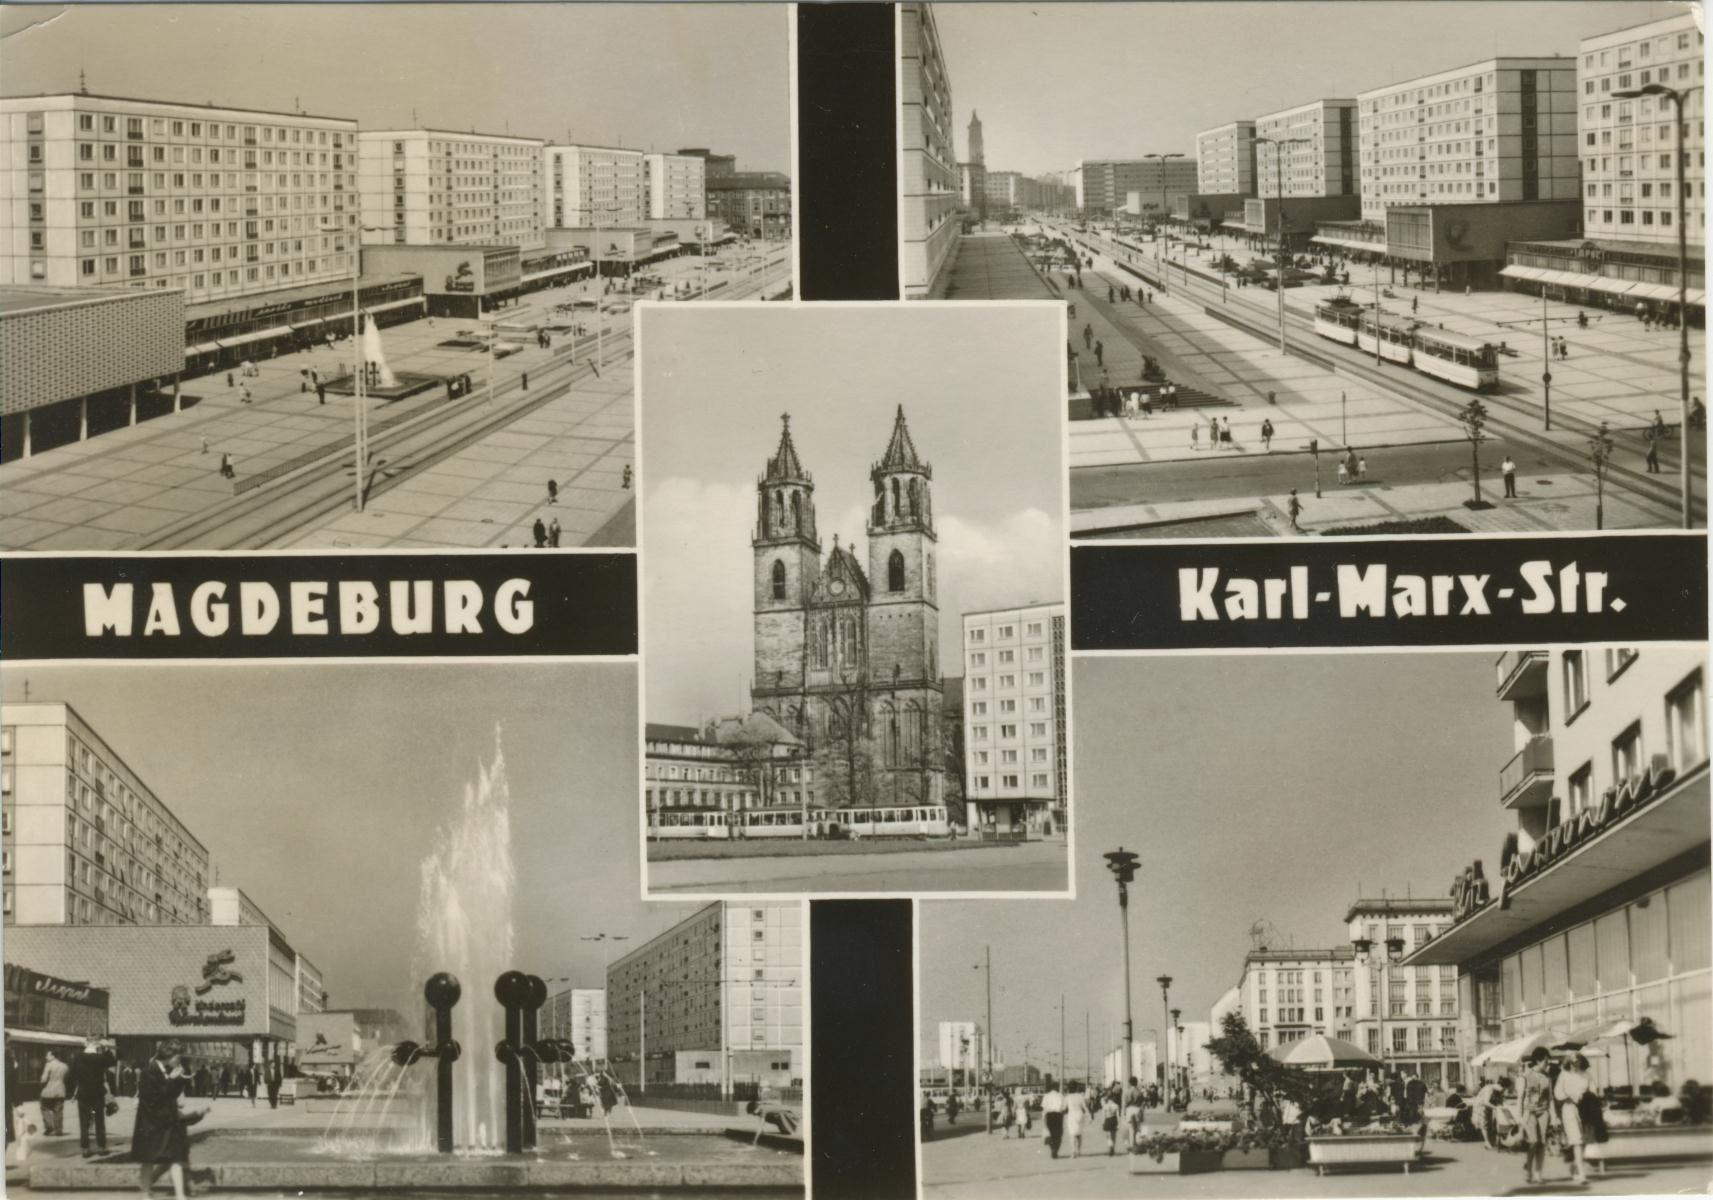 Magdeburg Ddr, Magdeburg und Karl marx